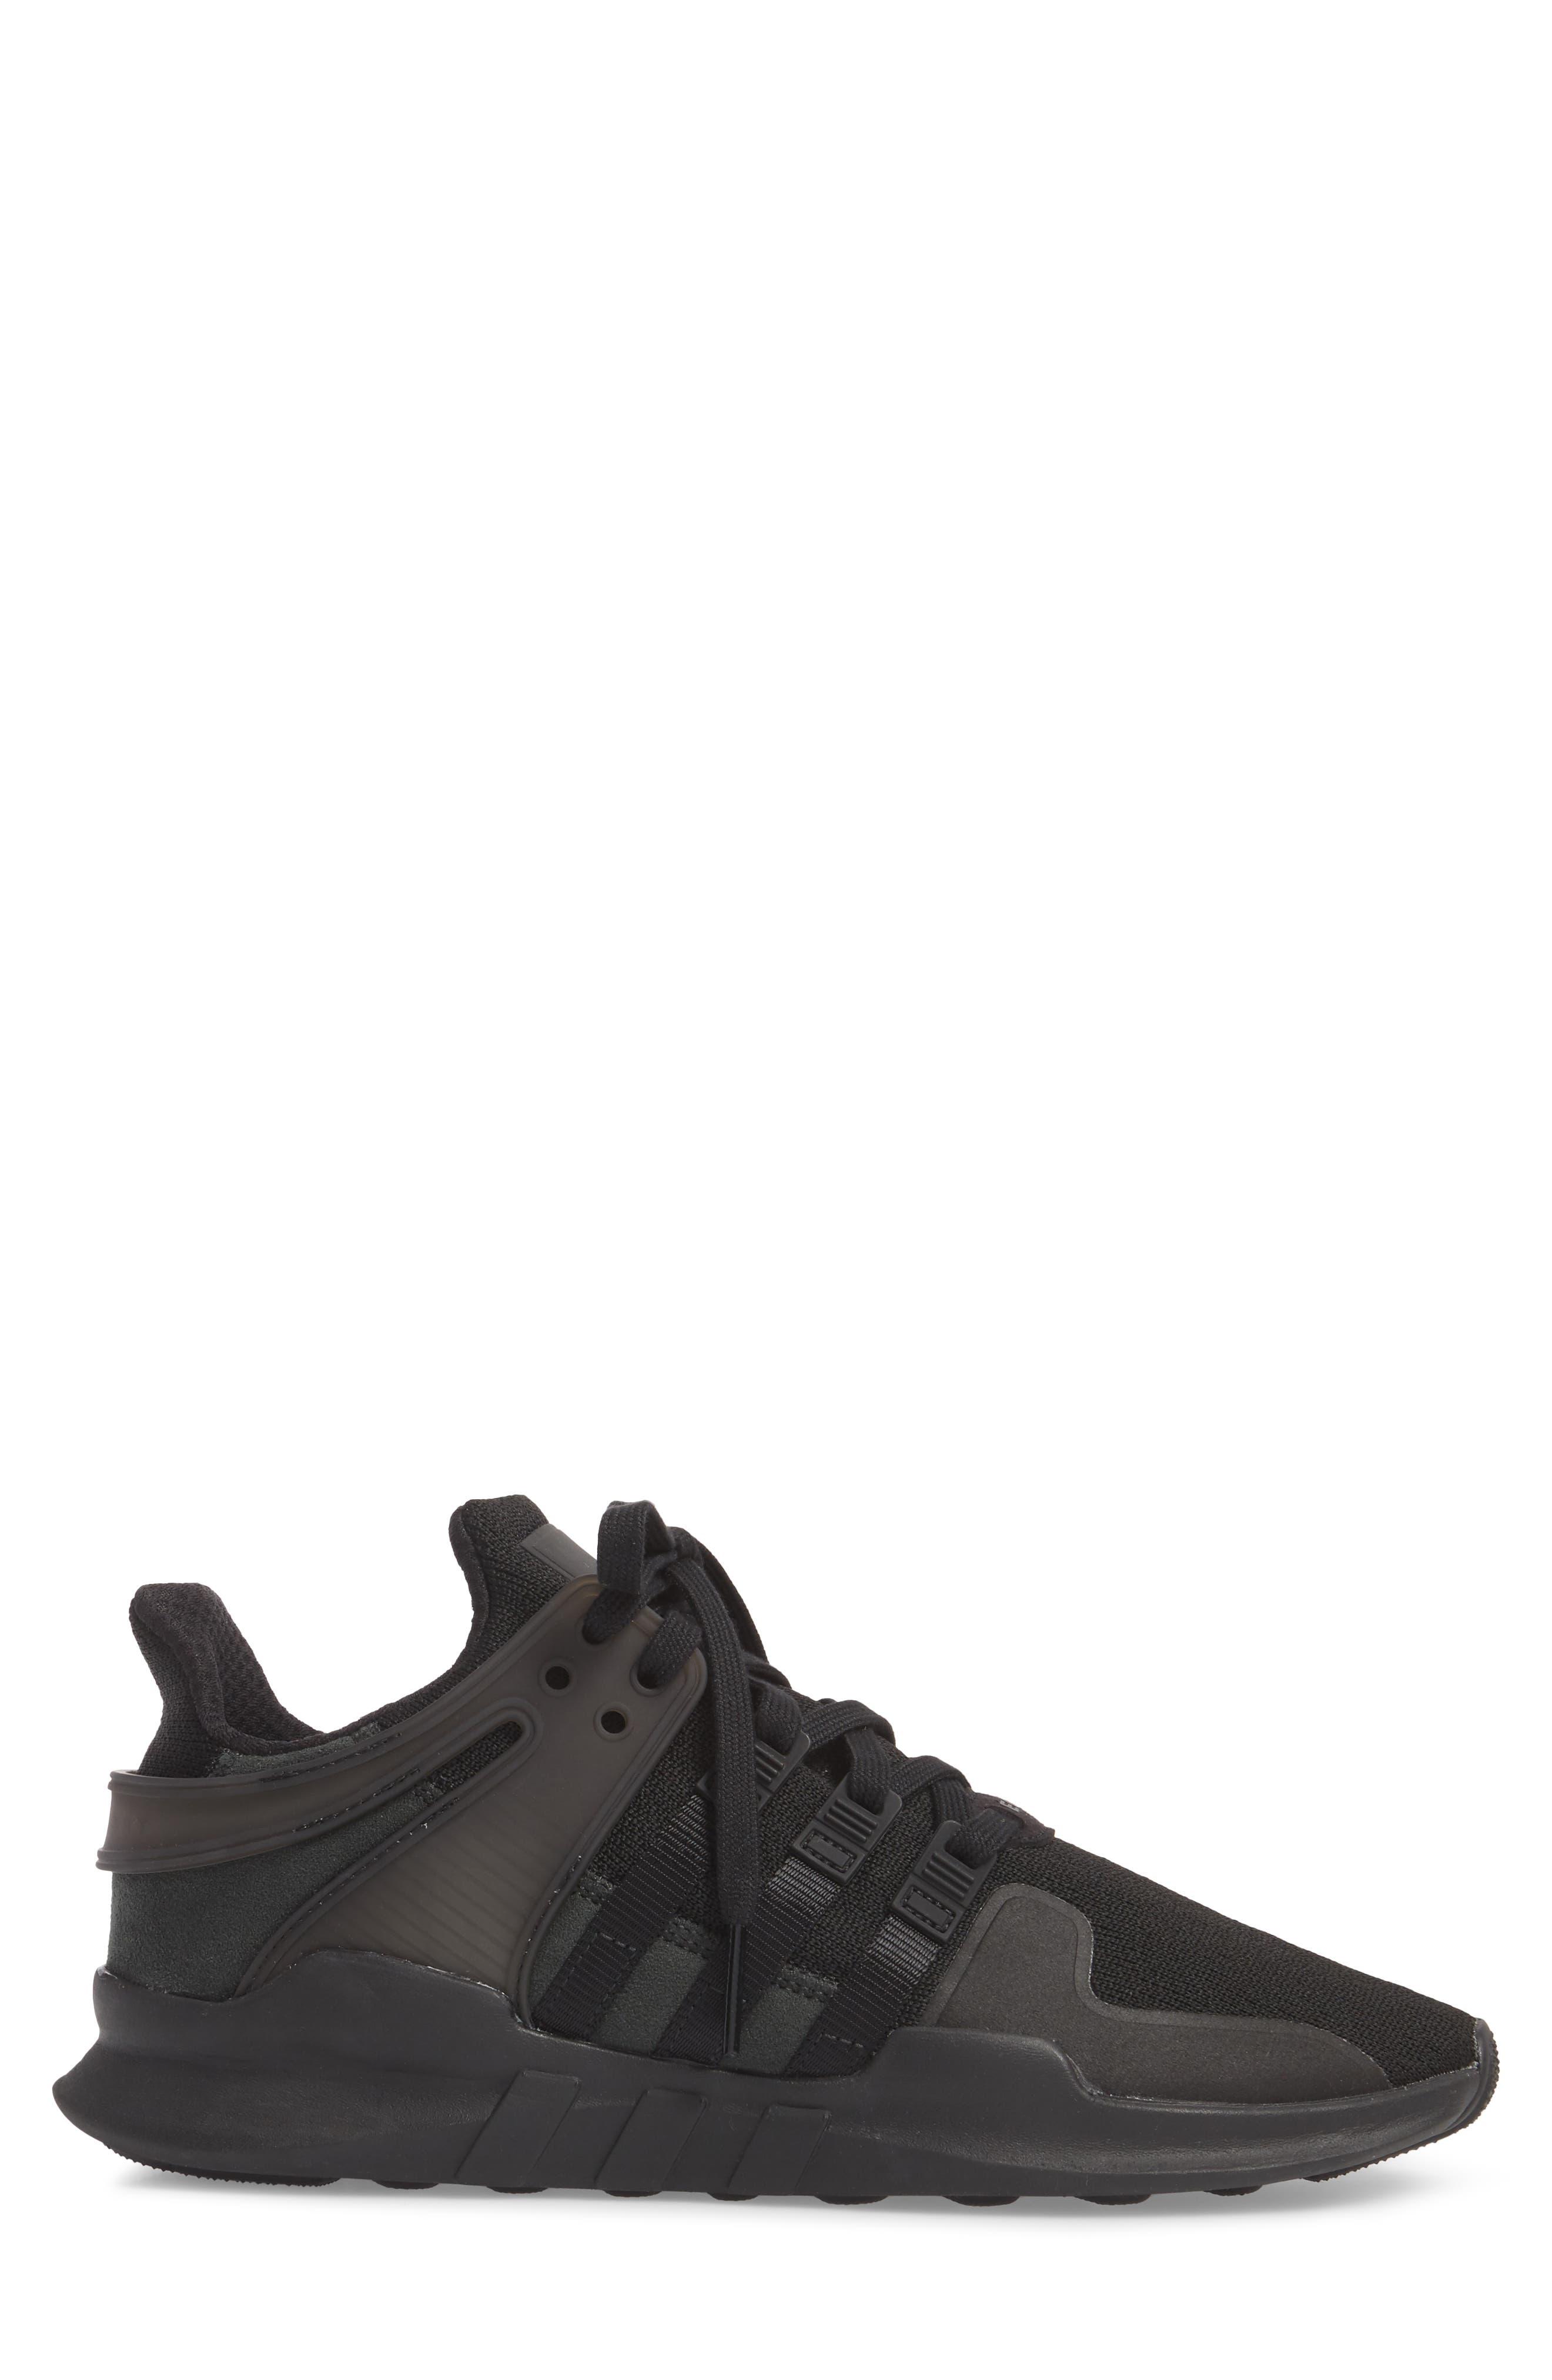 EQT Support Adv Sneaker,                             Alternate thumbnail 3, color,                             Core Black / Black / White